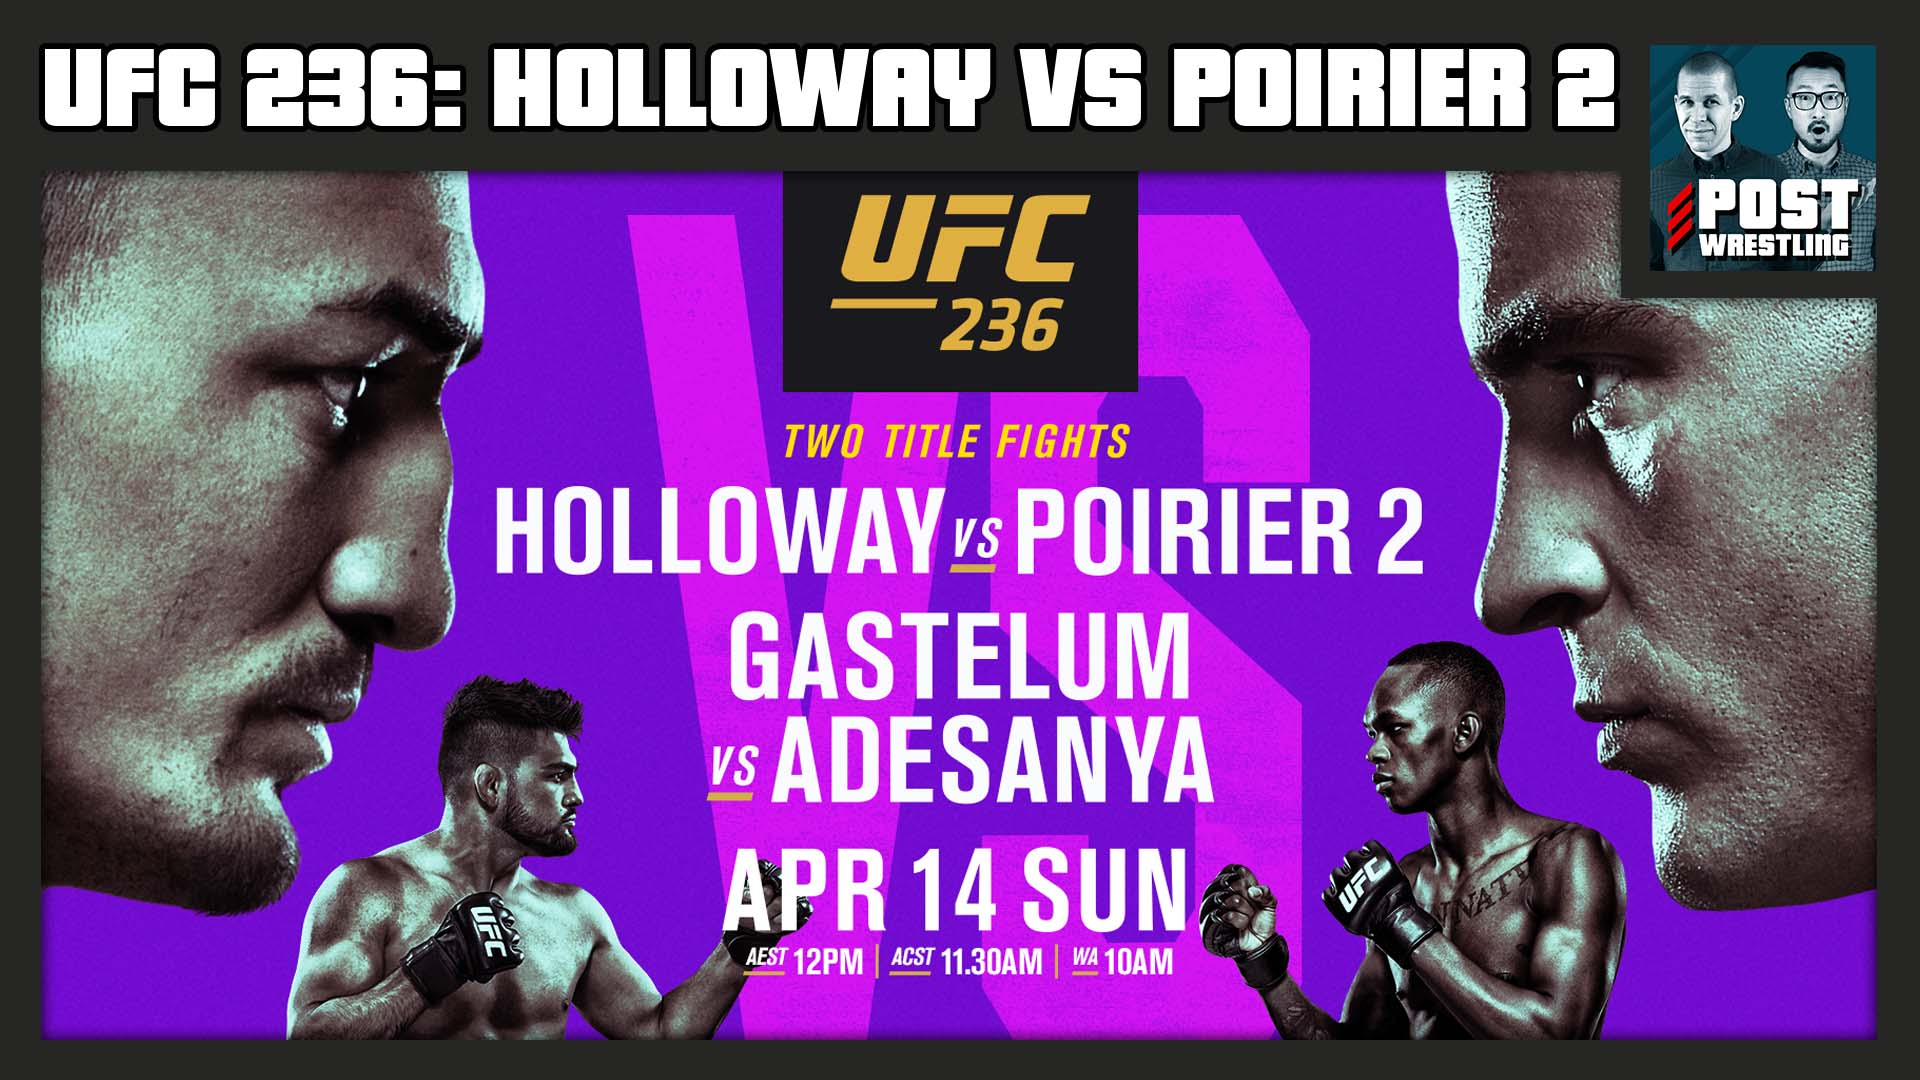 UFC 236 POST Show Holloway vs Poirier Gastelum vs Adesanya 1920x1080